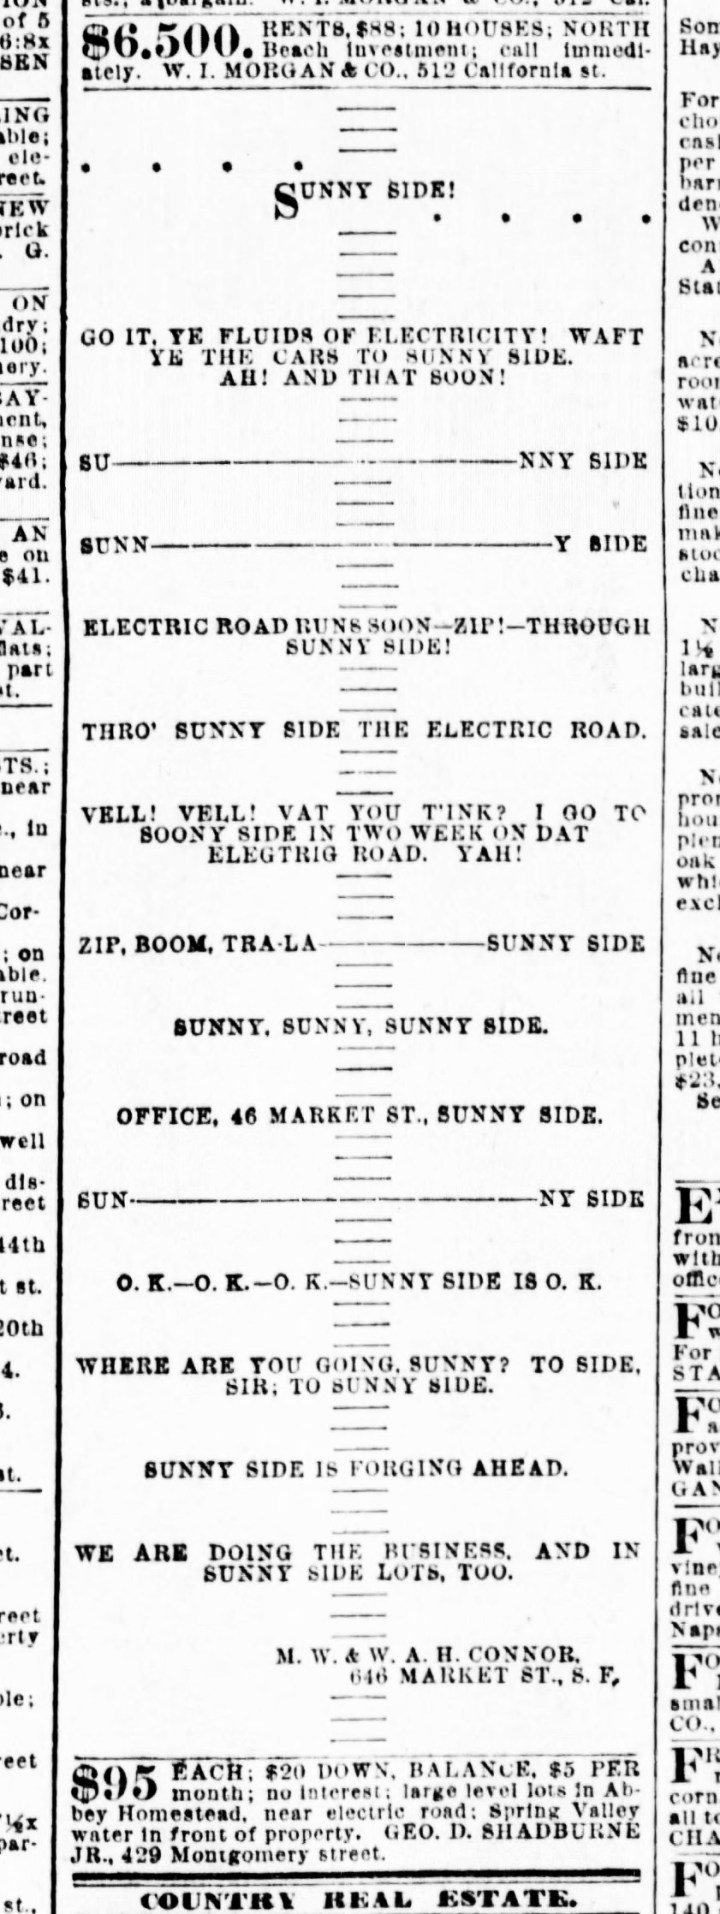 1892Apr10-Examiner-Sunnyside-classified-AD